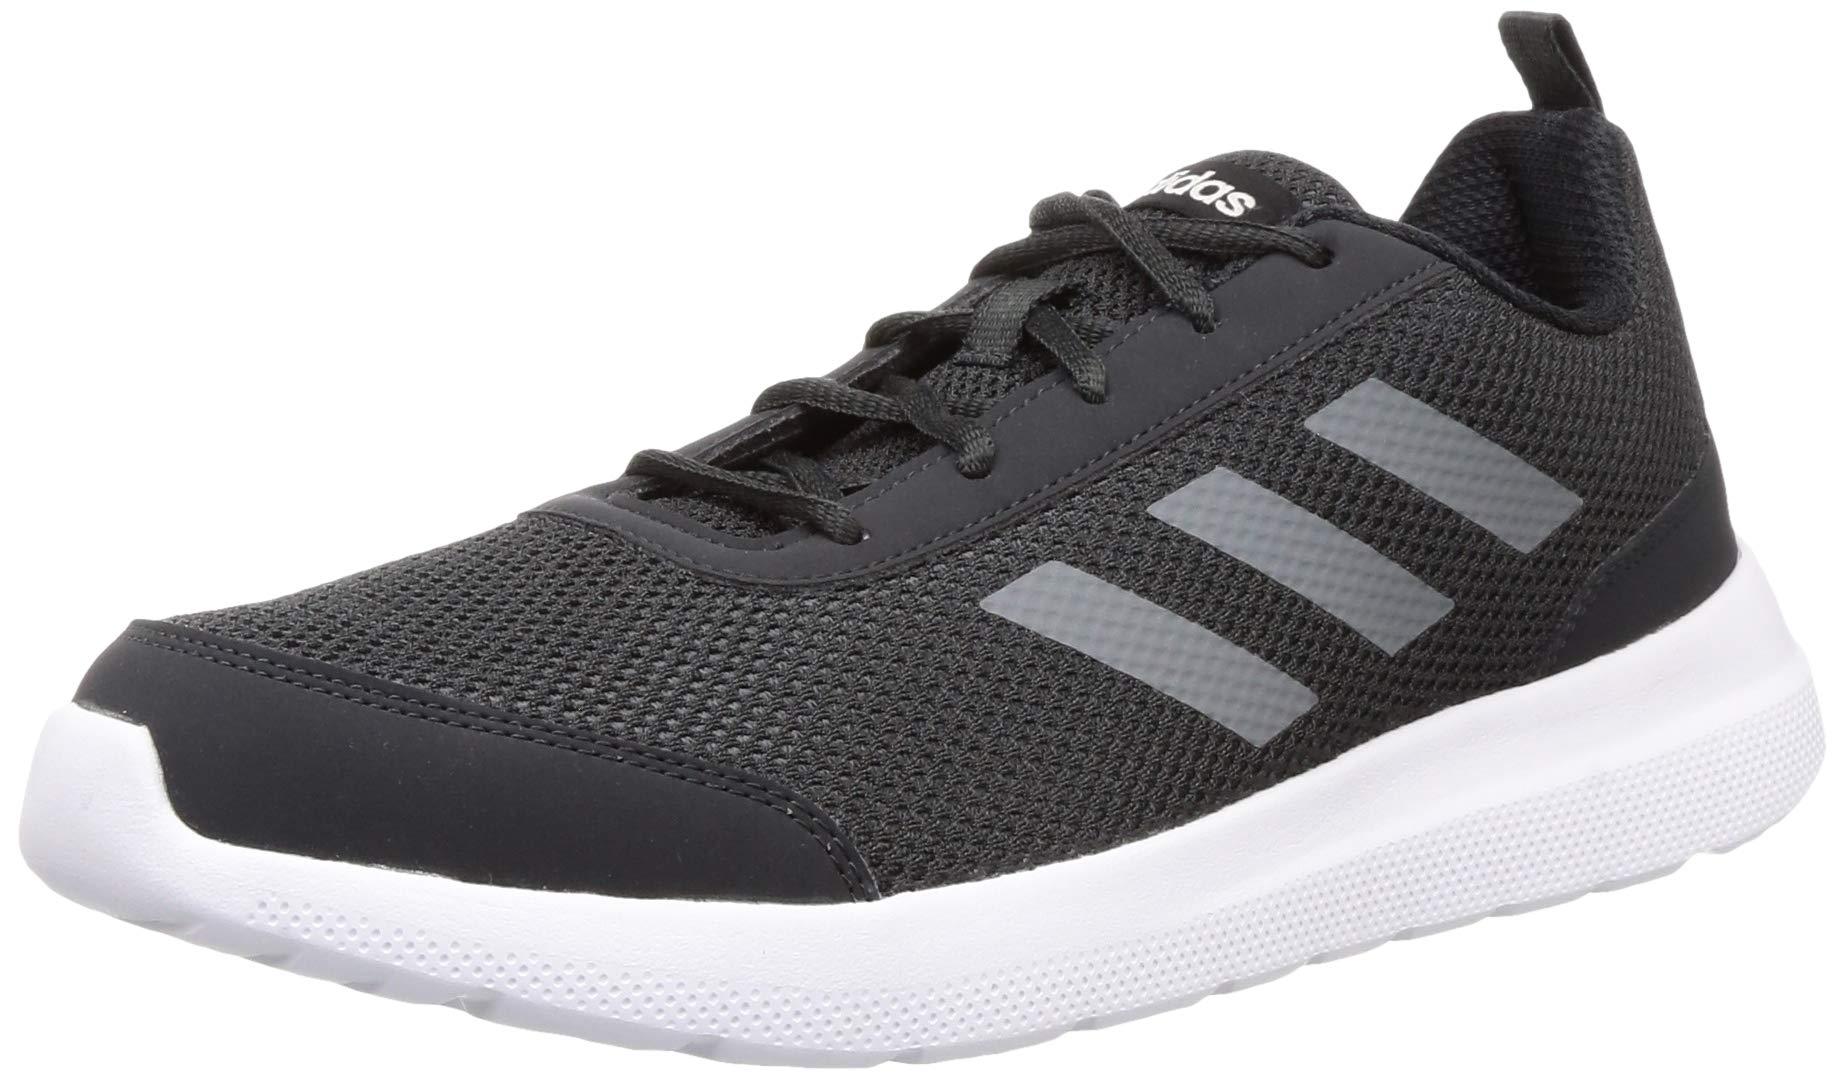 Adidas Men's Glenn M Carbon Sneakers-10 UK (44 2/3 EU) (10.5 US) (CM4547) (B07Z57ZC1D) Amazon Price History, Amazon Price Tracker